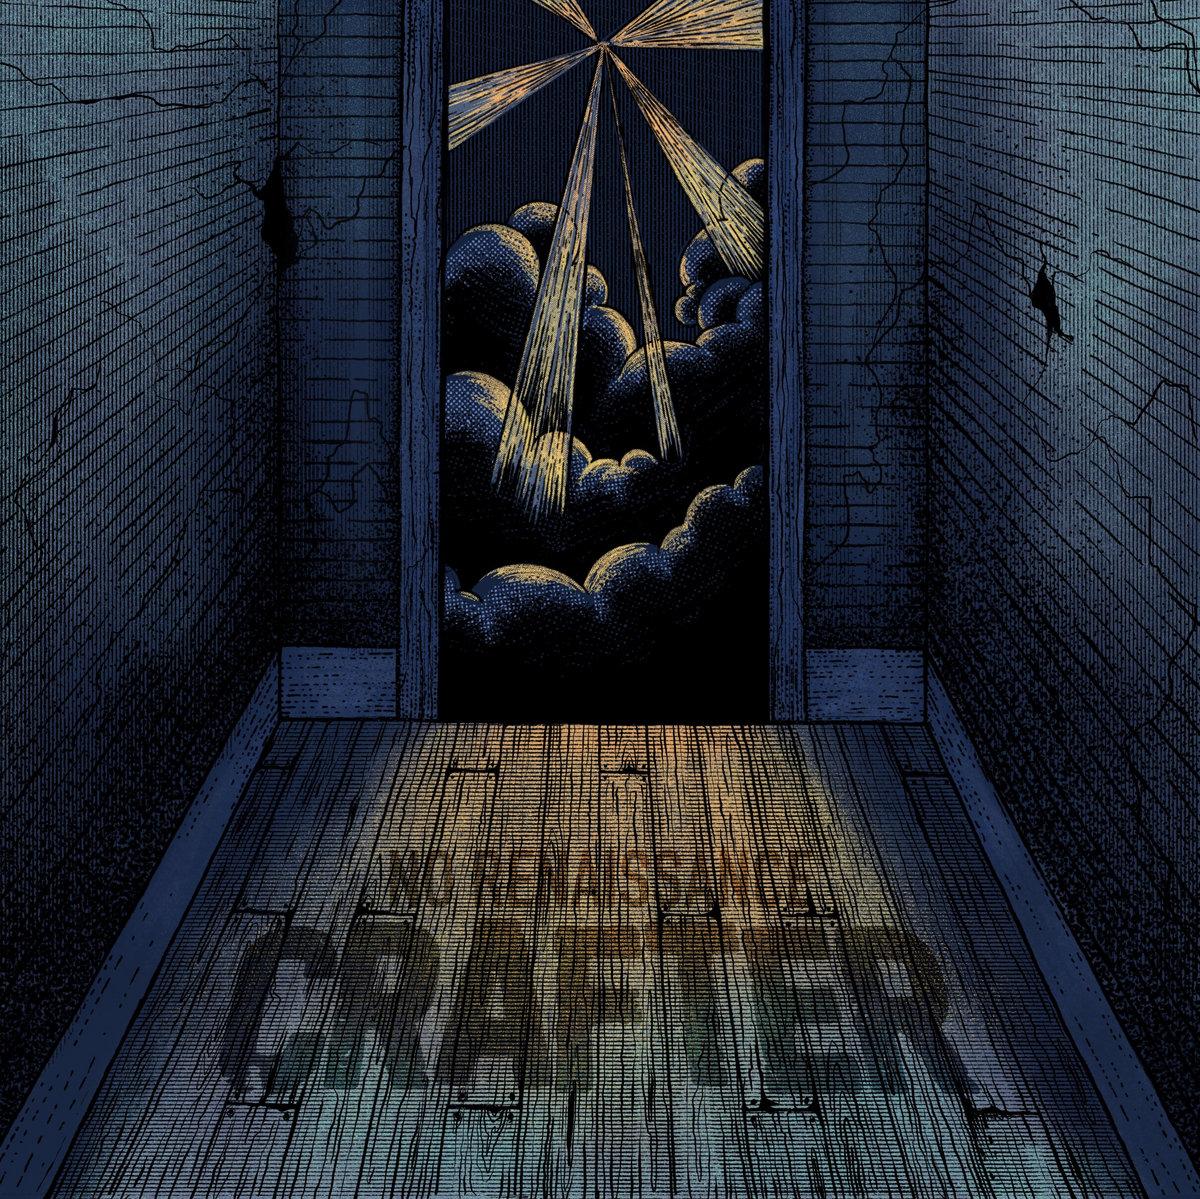 Crafter - No Renaissance [EP] (2020)